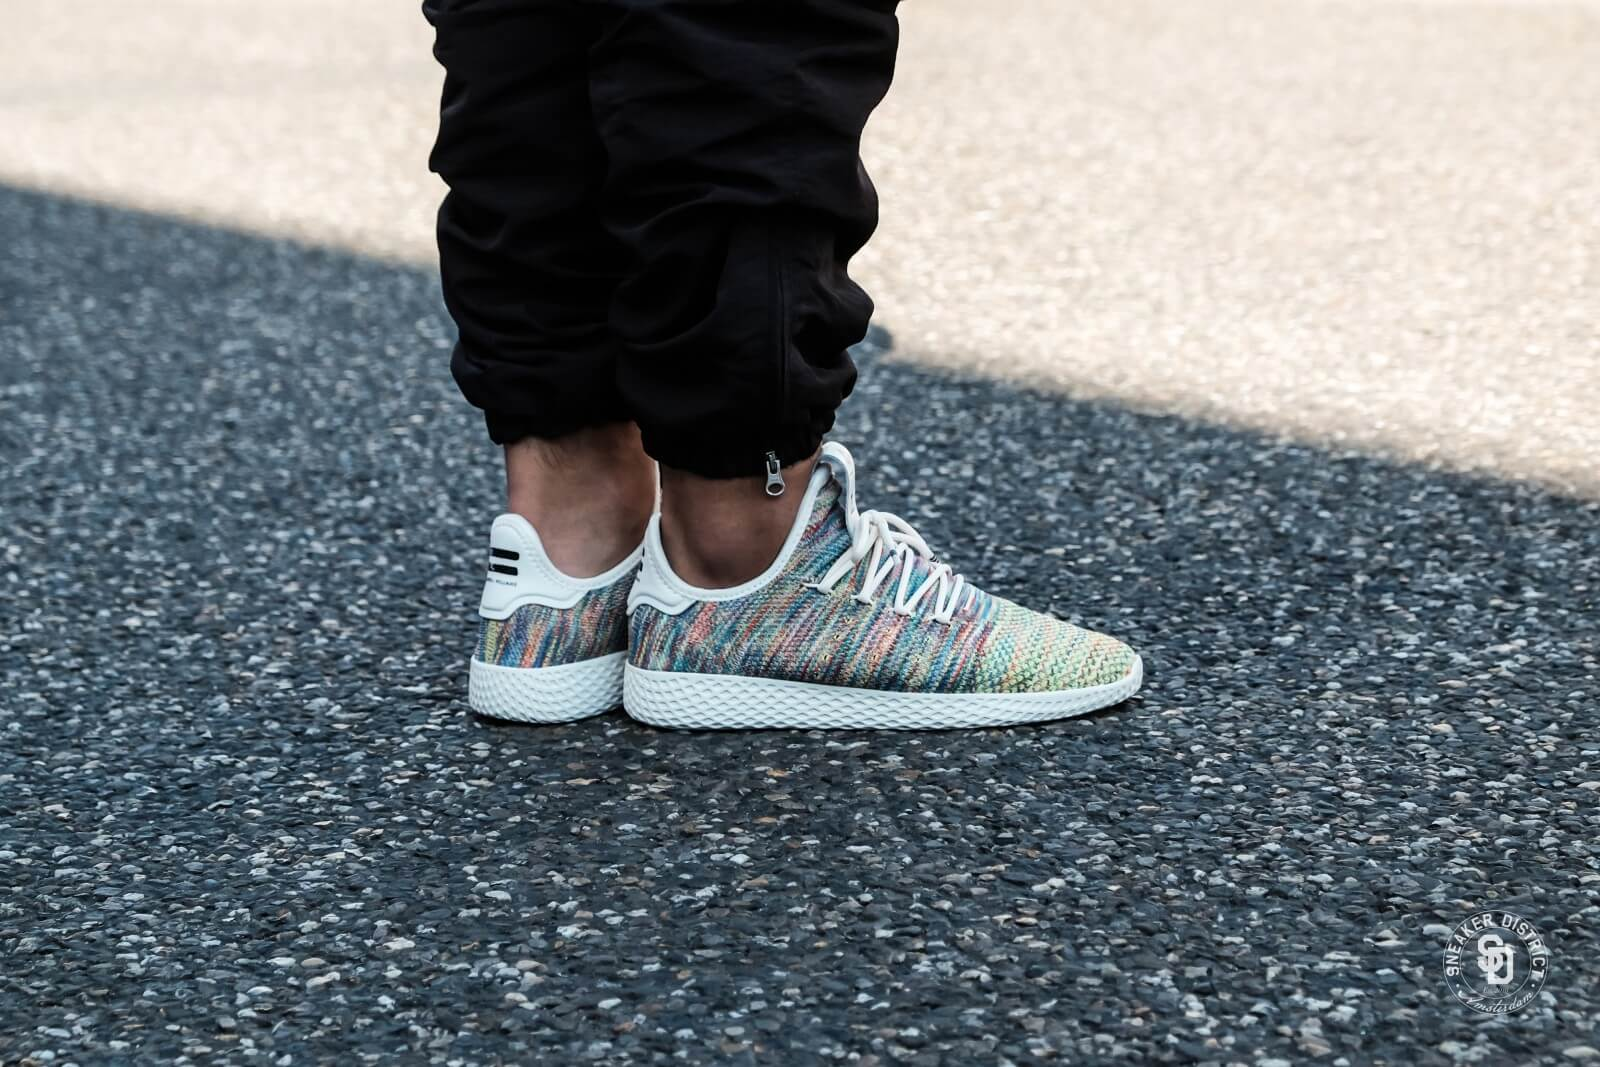 Adidas x Pharrell WIlliams HU Primeknit Multicolor